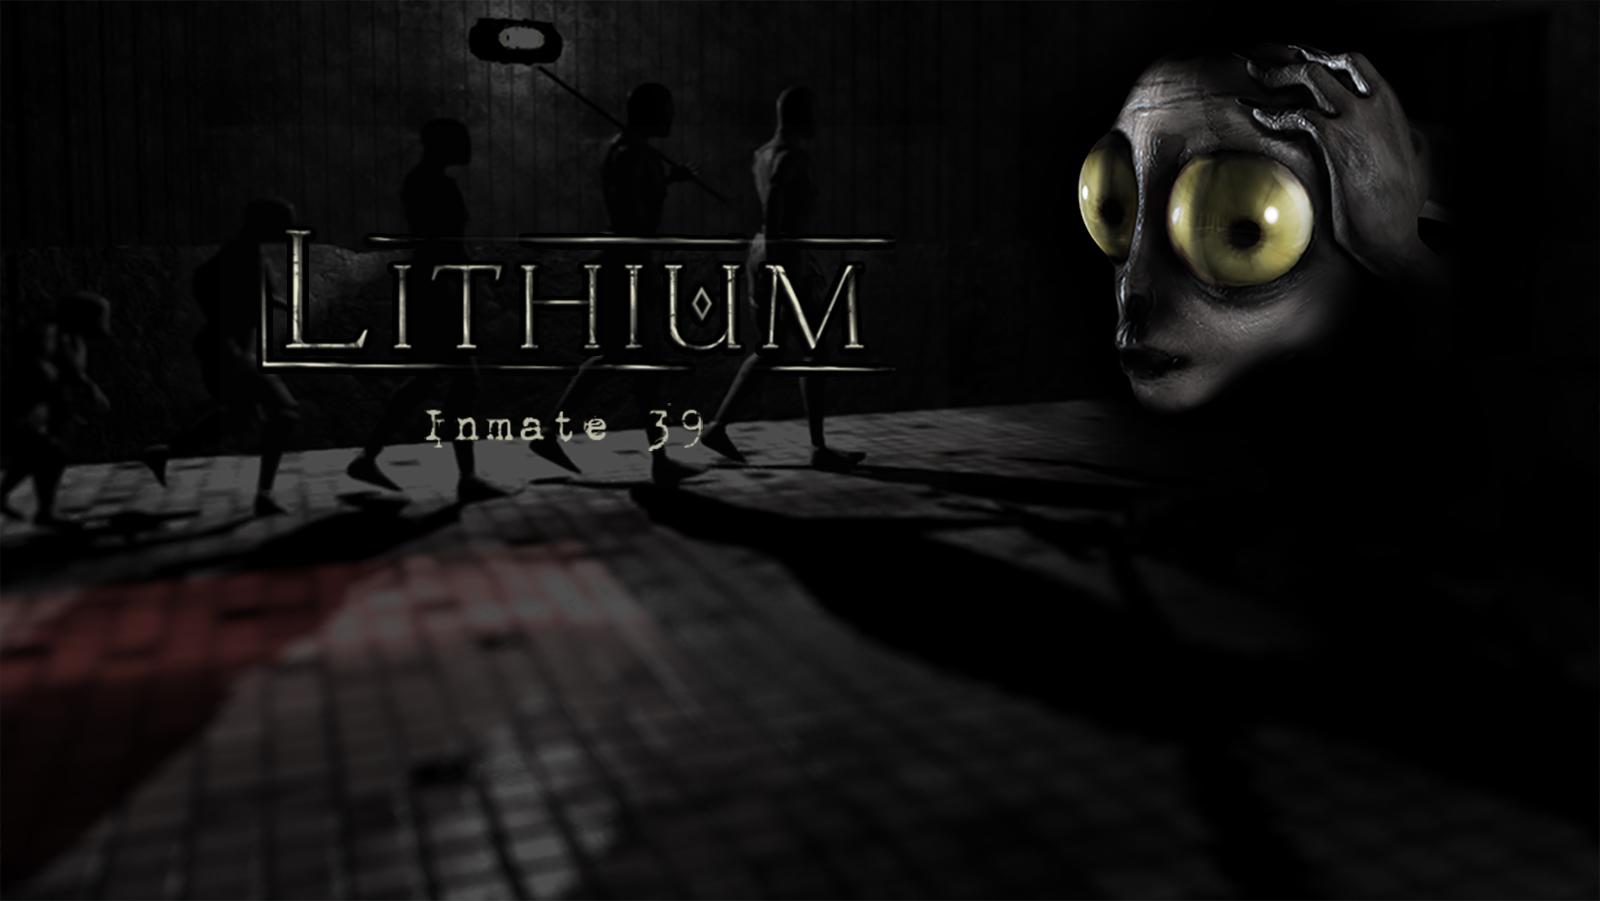 Resultado de imagem para Lithium: Inmate 39